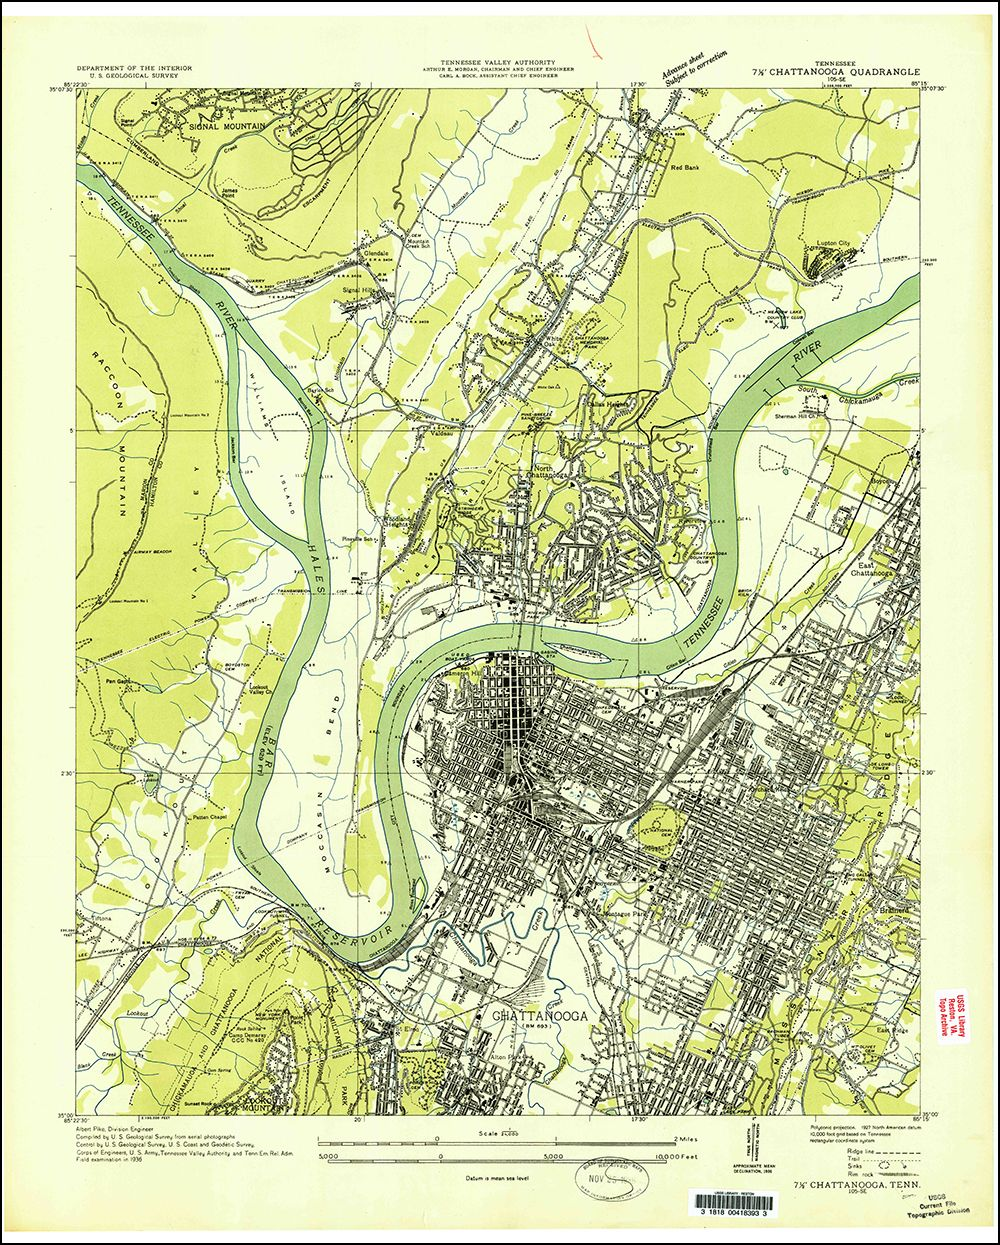 1936 Chattanooga, Tennessee 7.5 minute series quadrangle (1:24,000 on